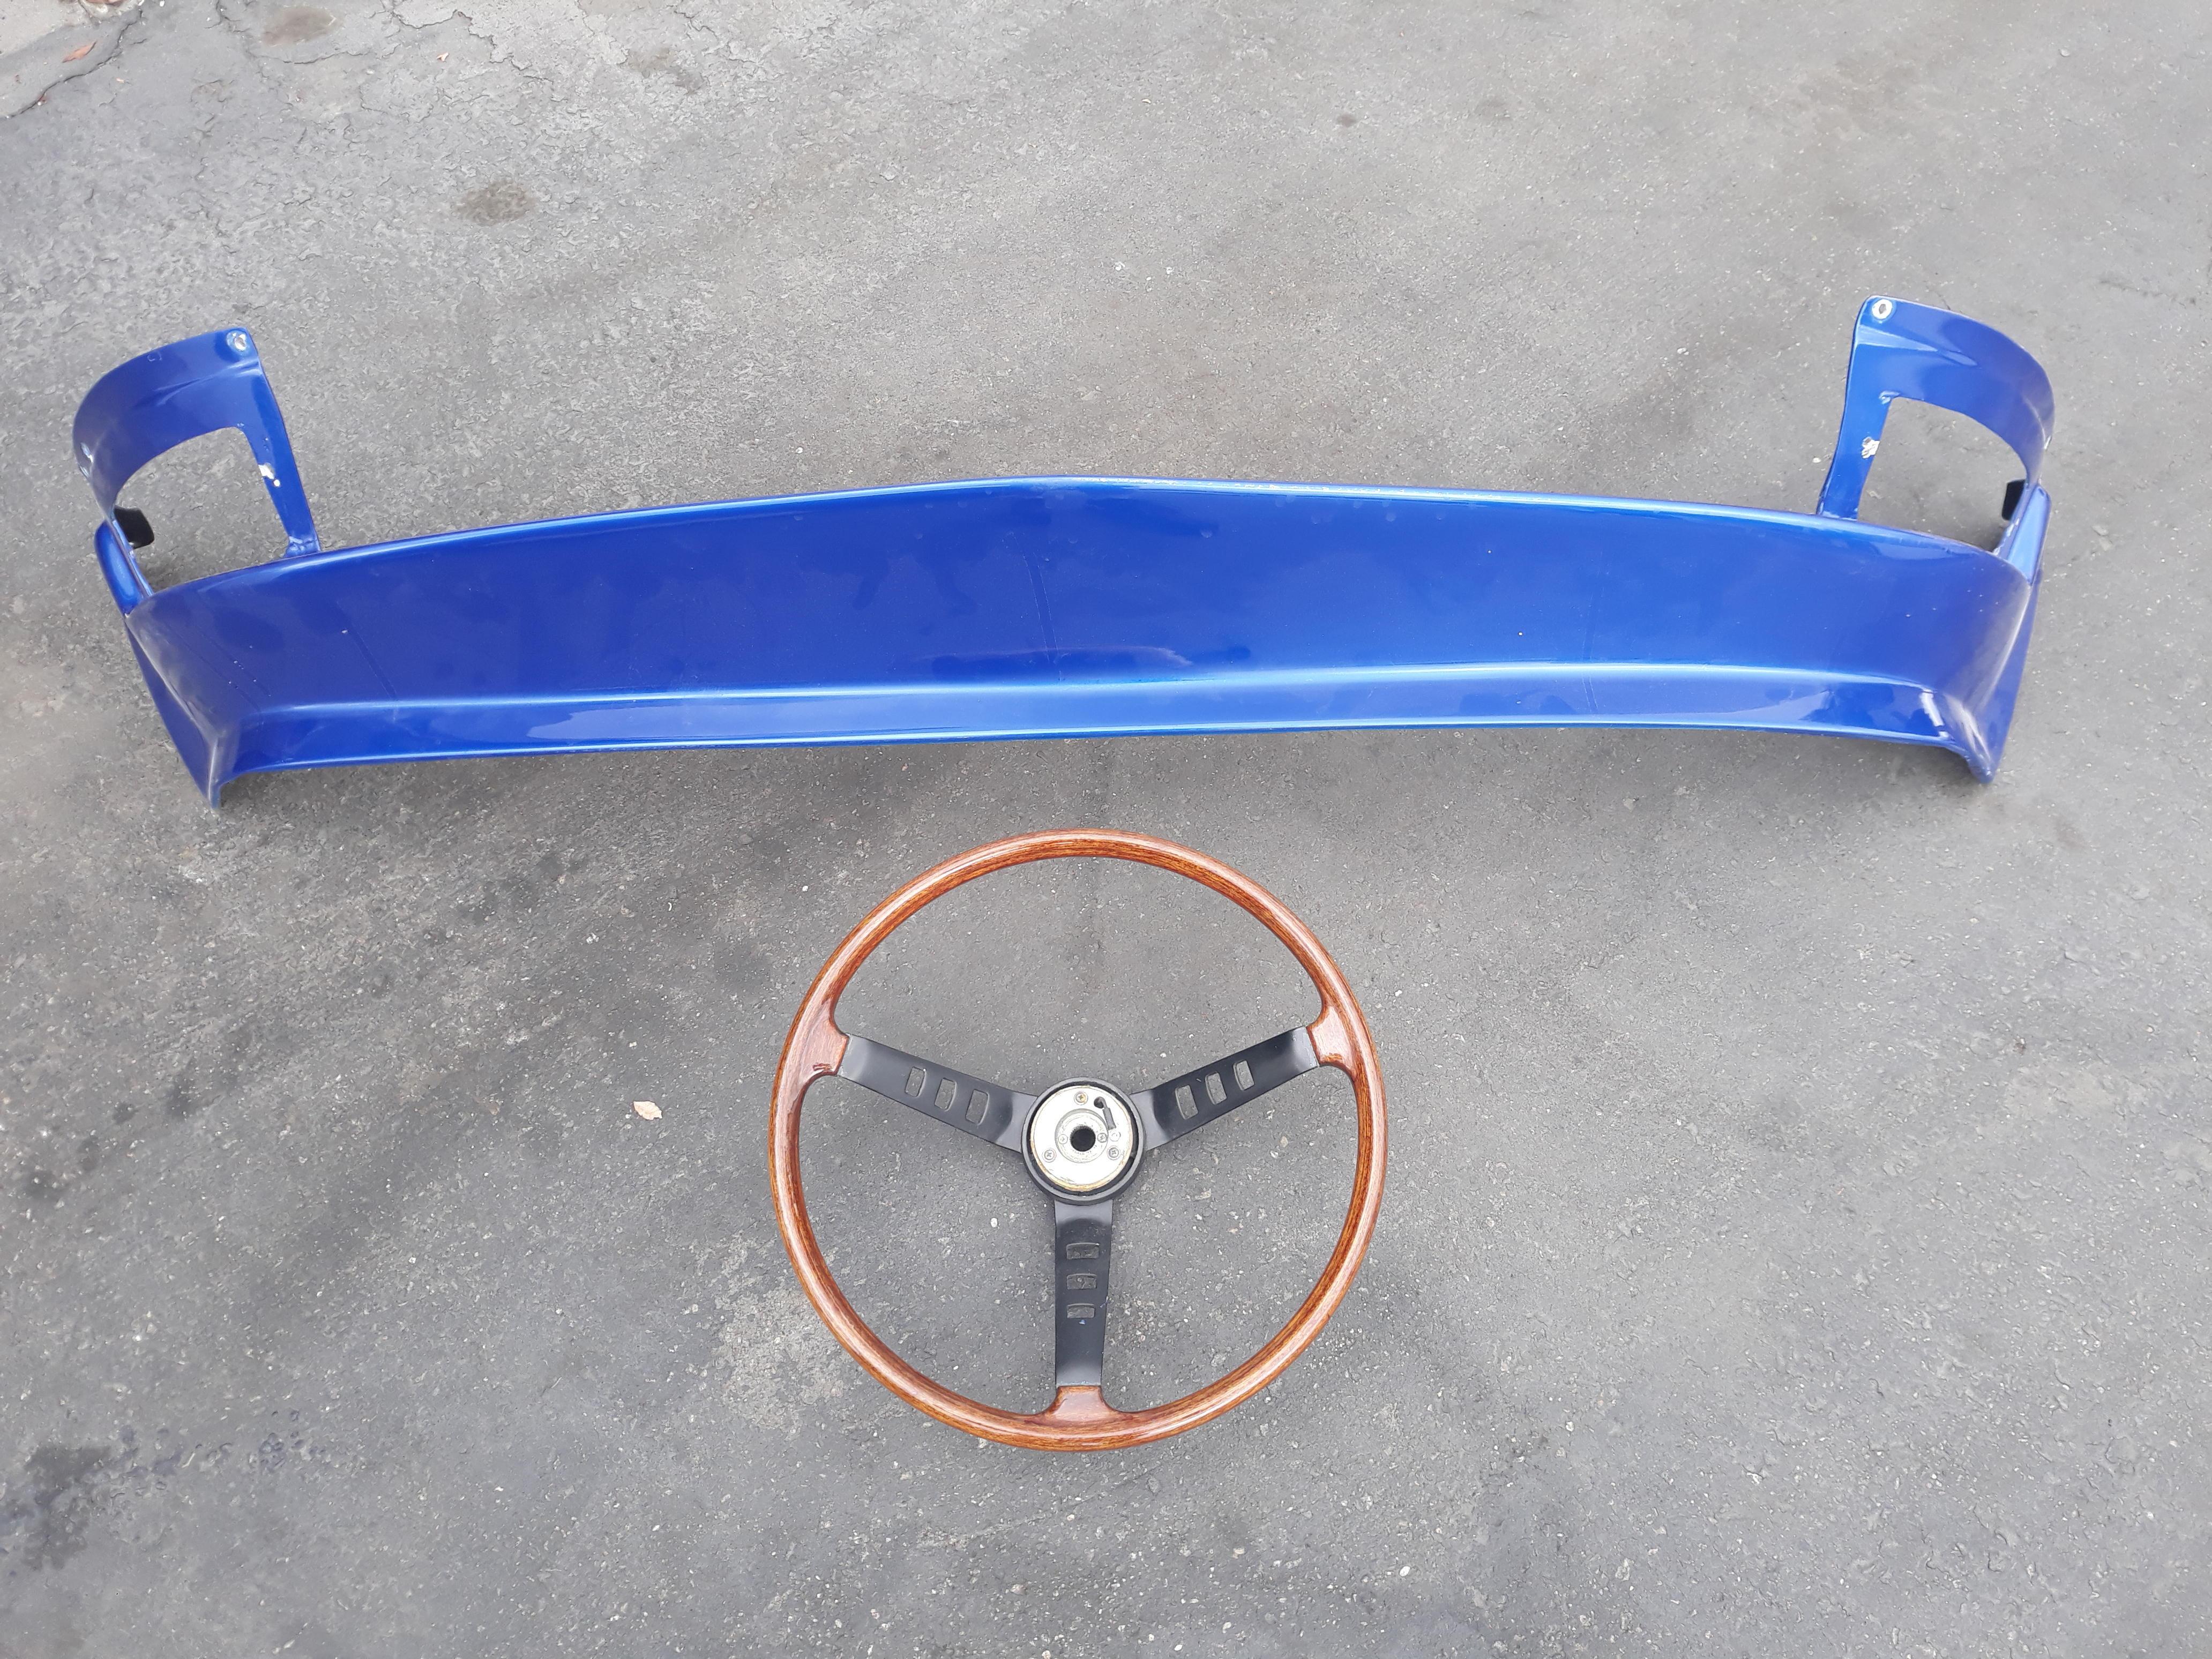 Datsun 240 Z Steering Wheel and Valance